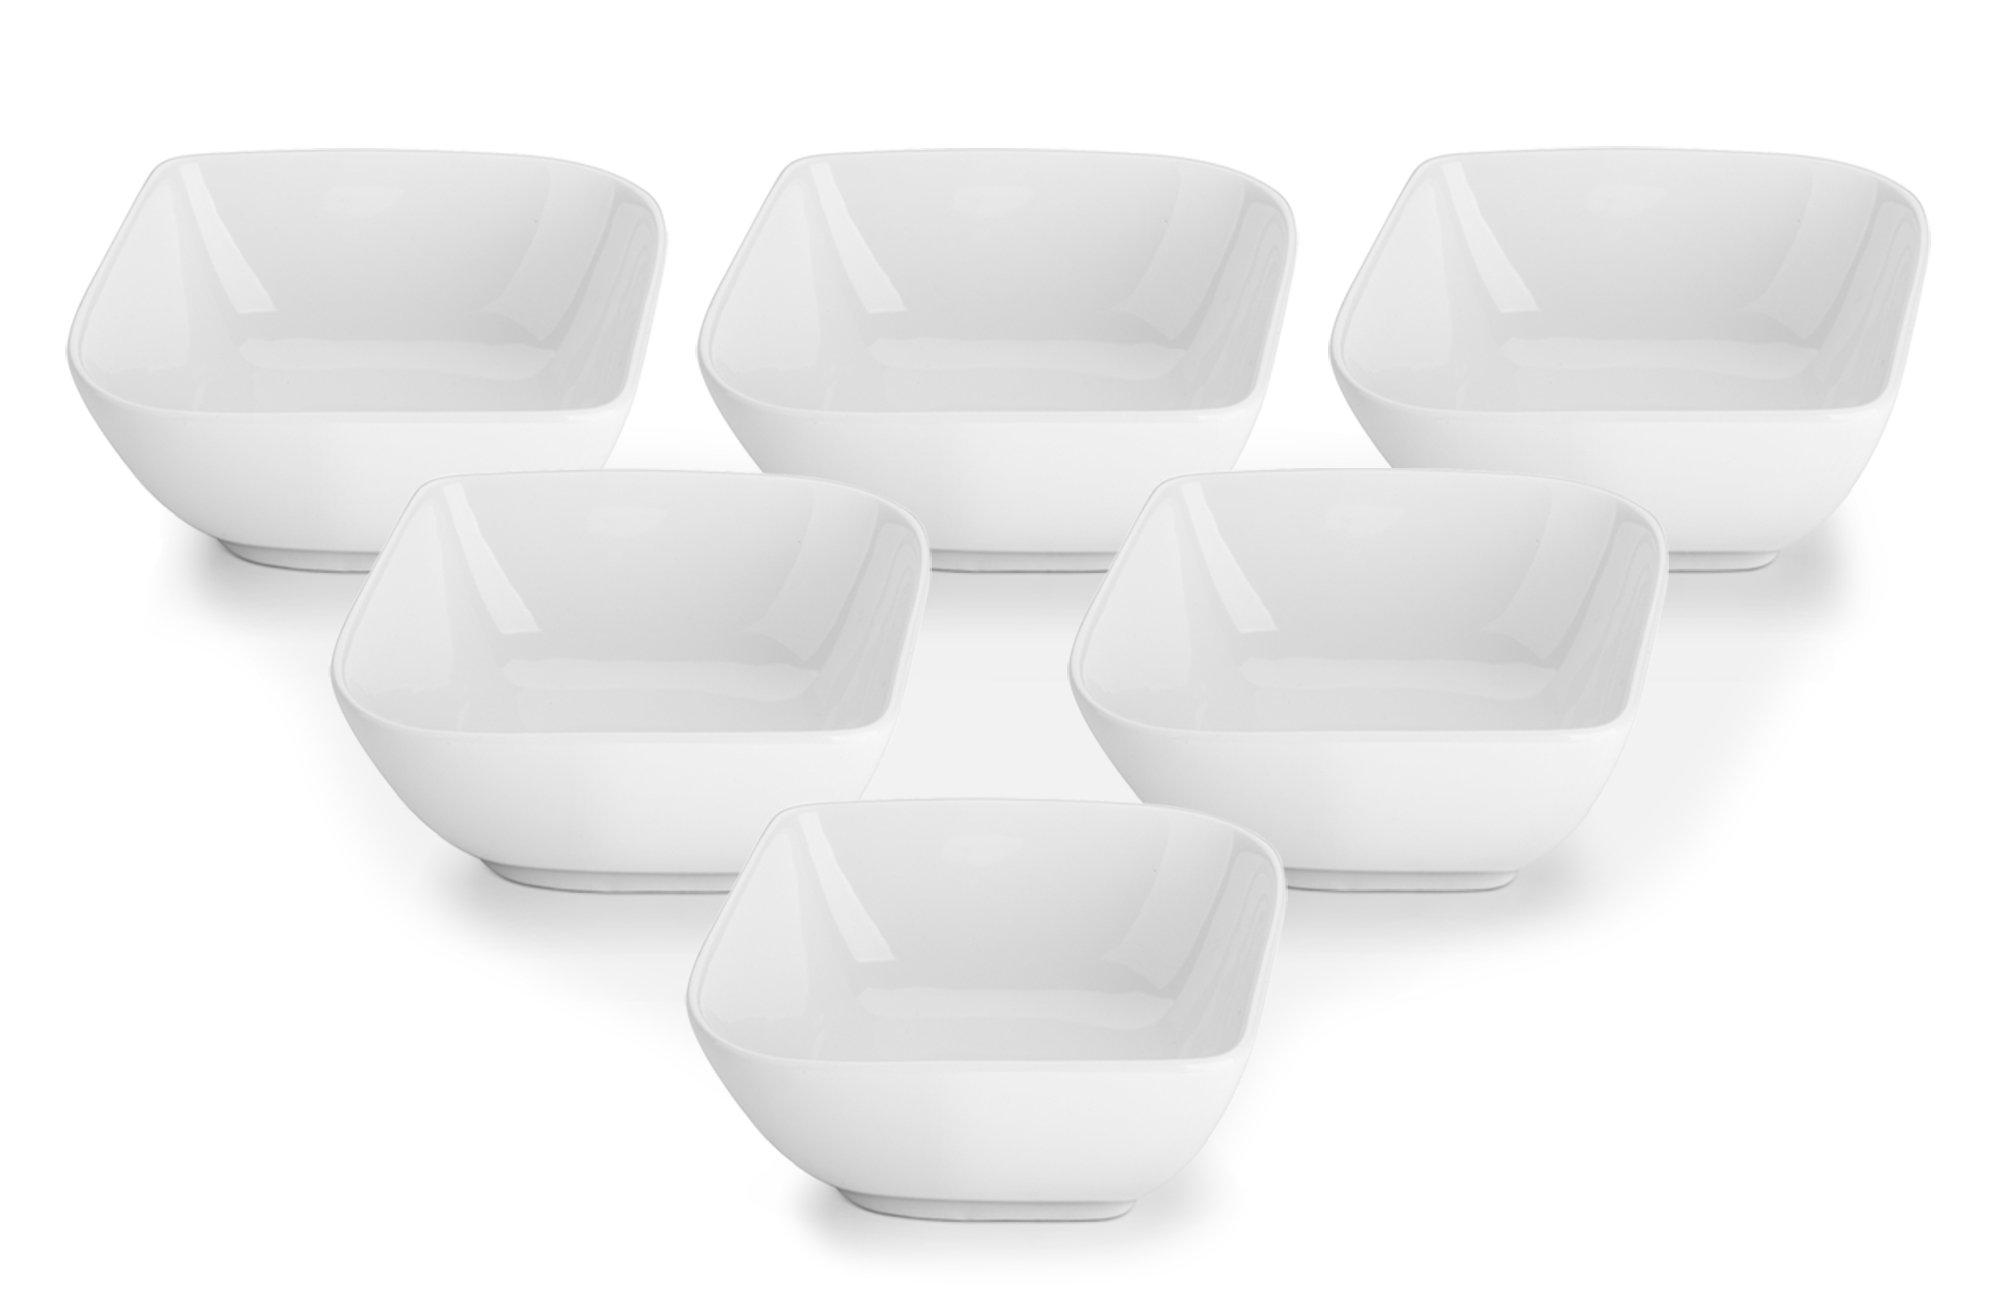 DOWAN 8 Ounces Porcelain Ramekins, Dessert Bowls, Set of 6, White, Stylish Square by DOWAN